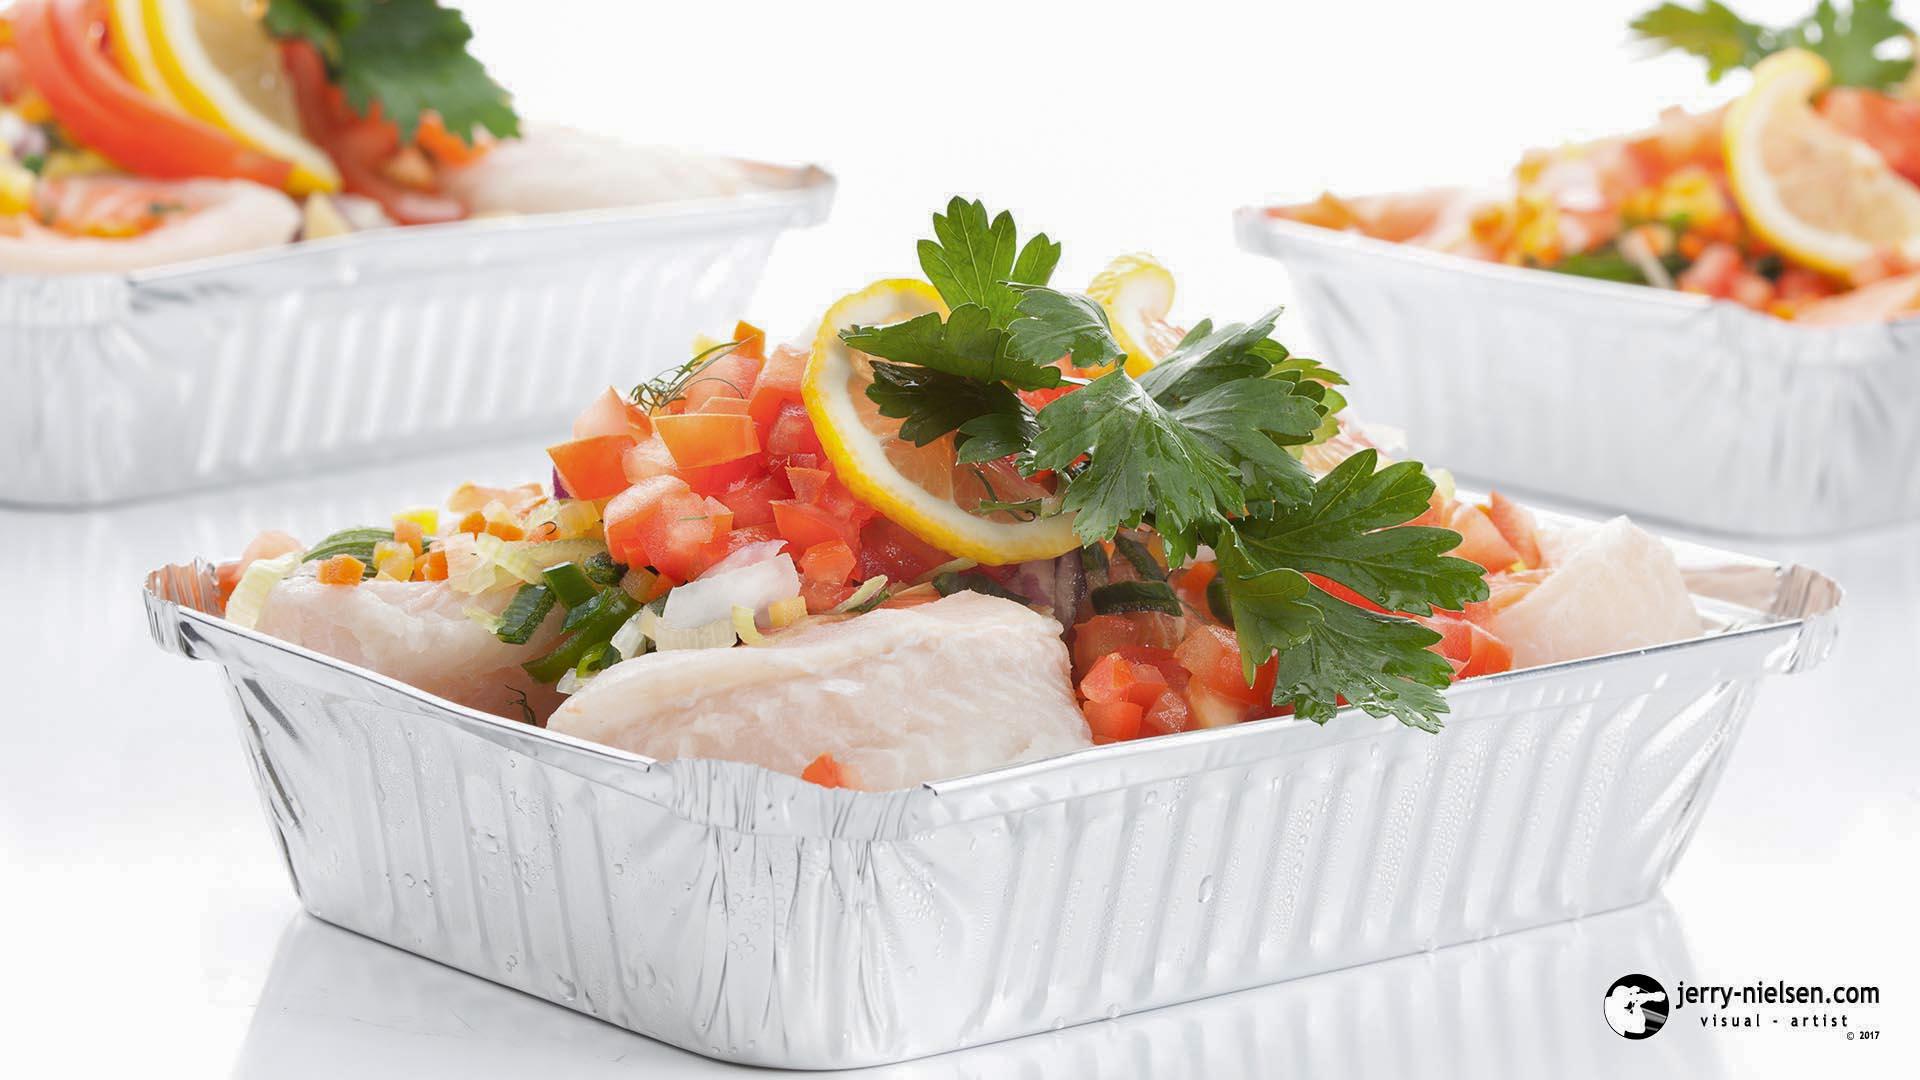 Prepared Fish Dinner